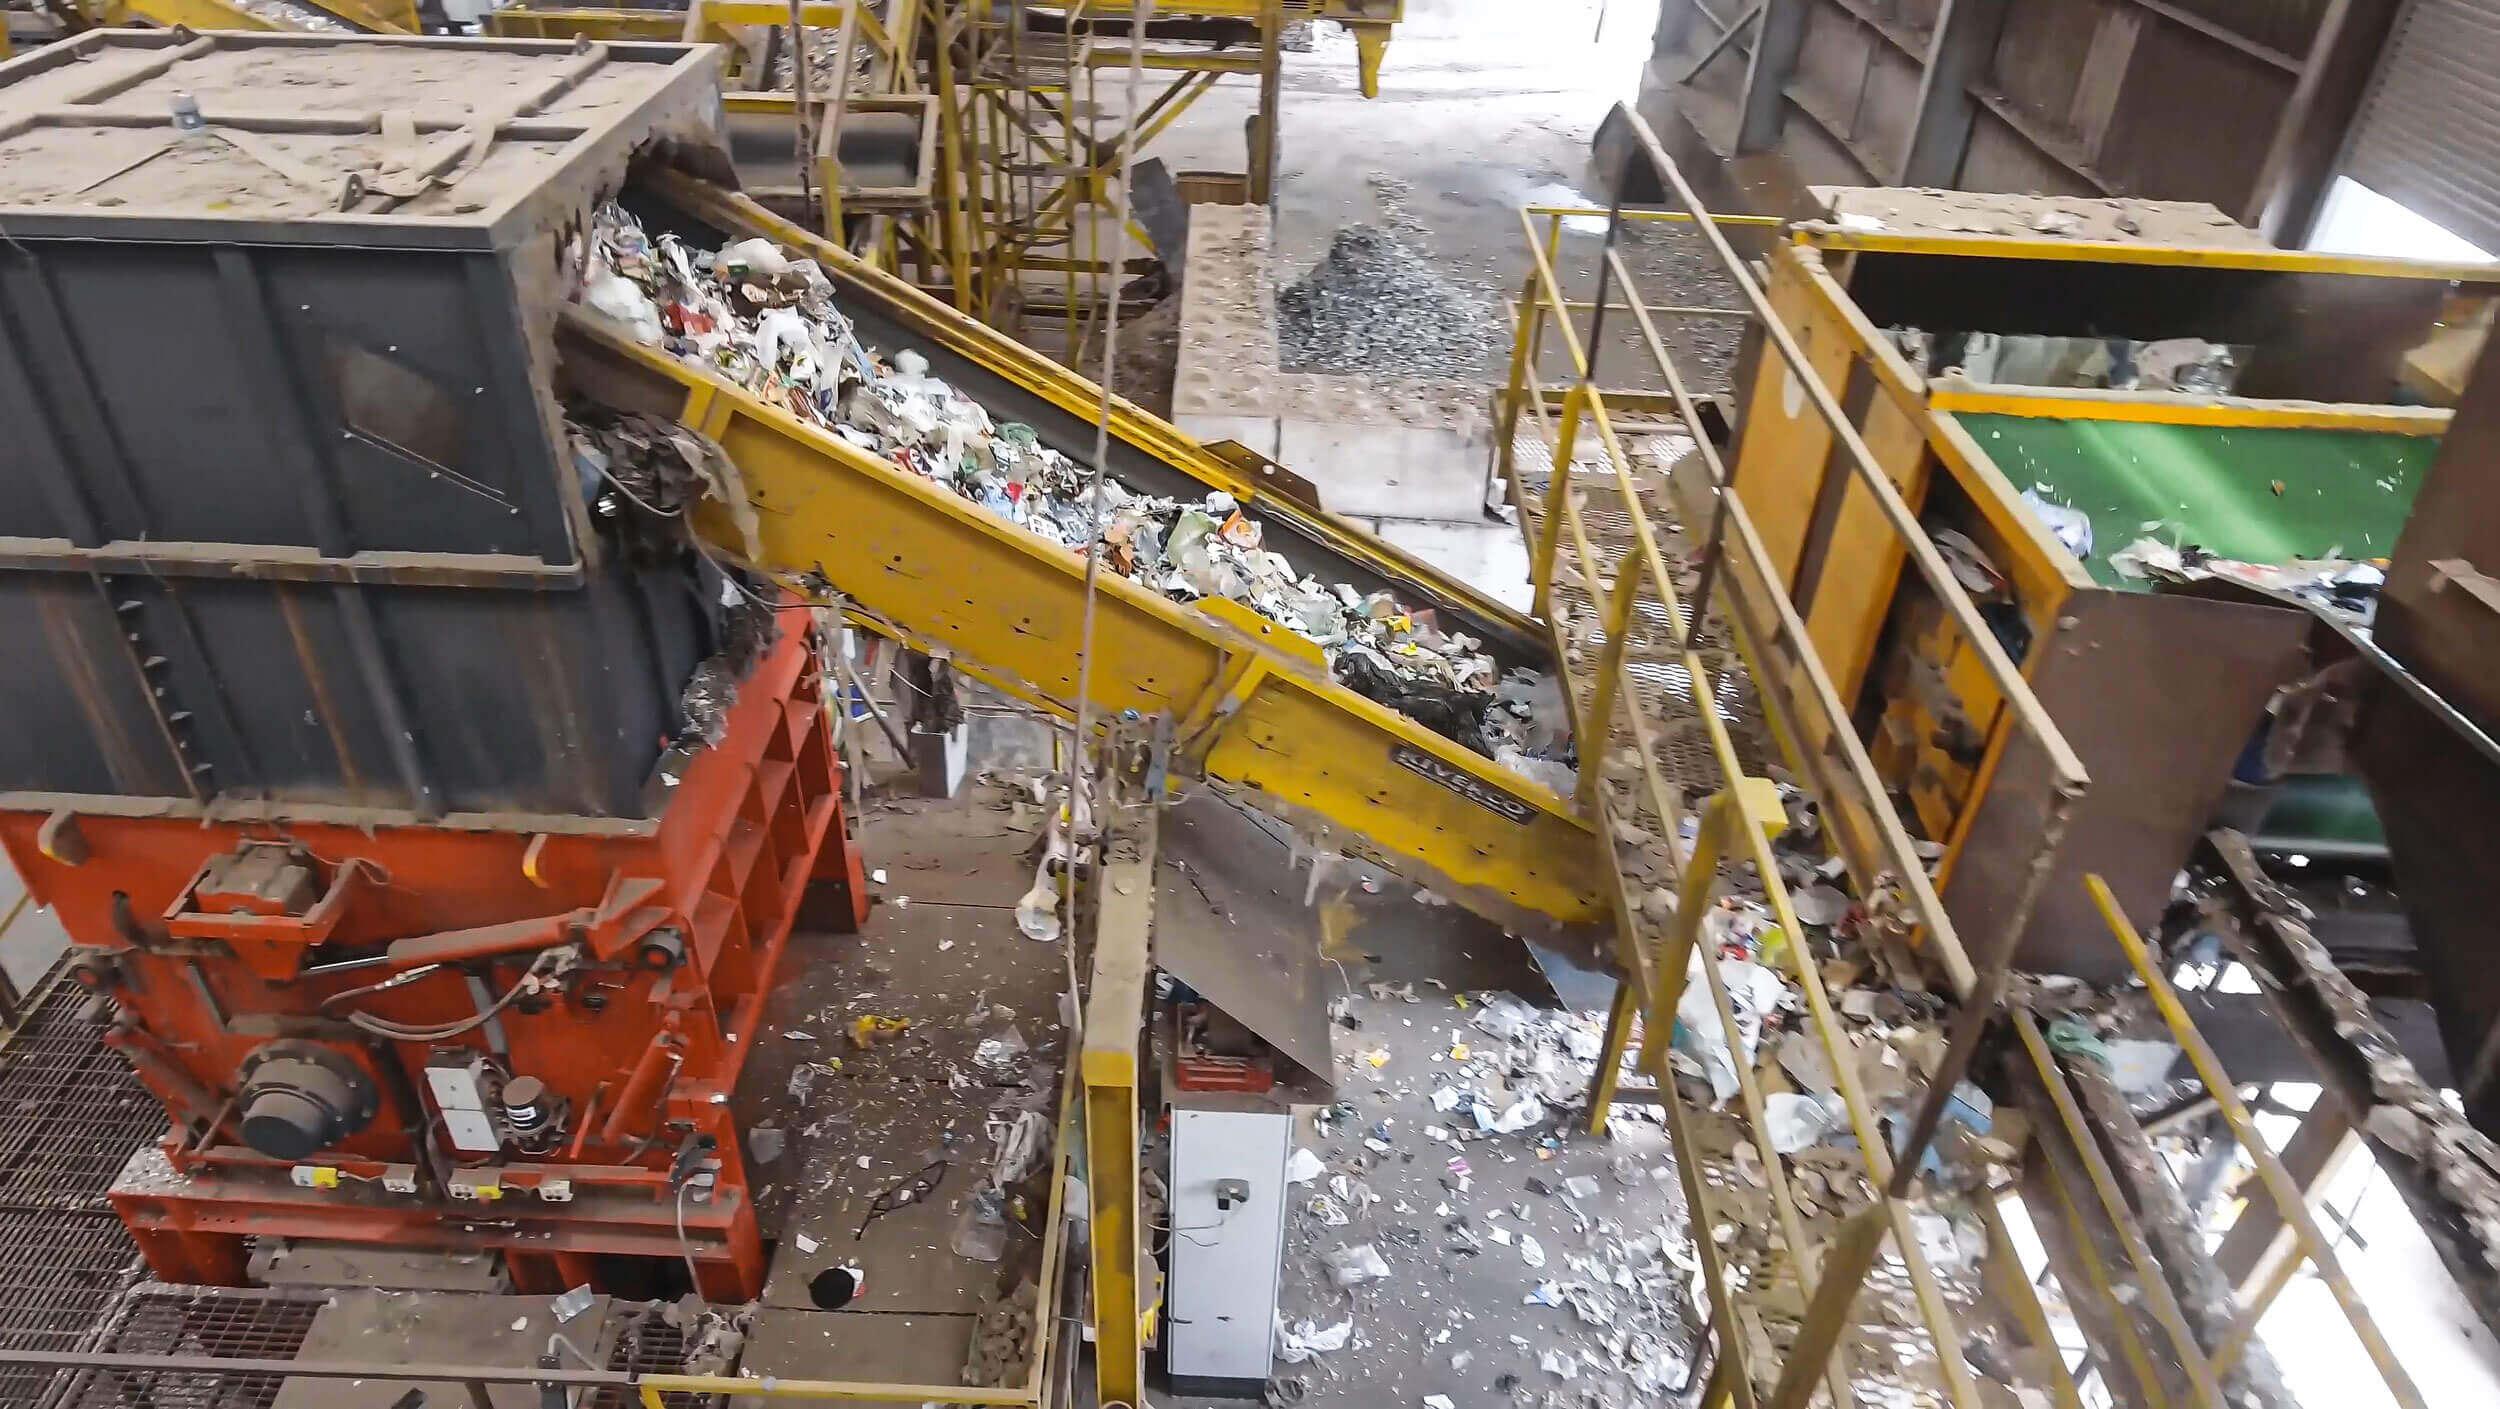 The WEIMA PowerLine 2000 shredder is fed by conveyor belt.